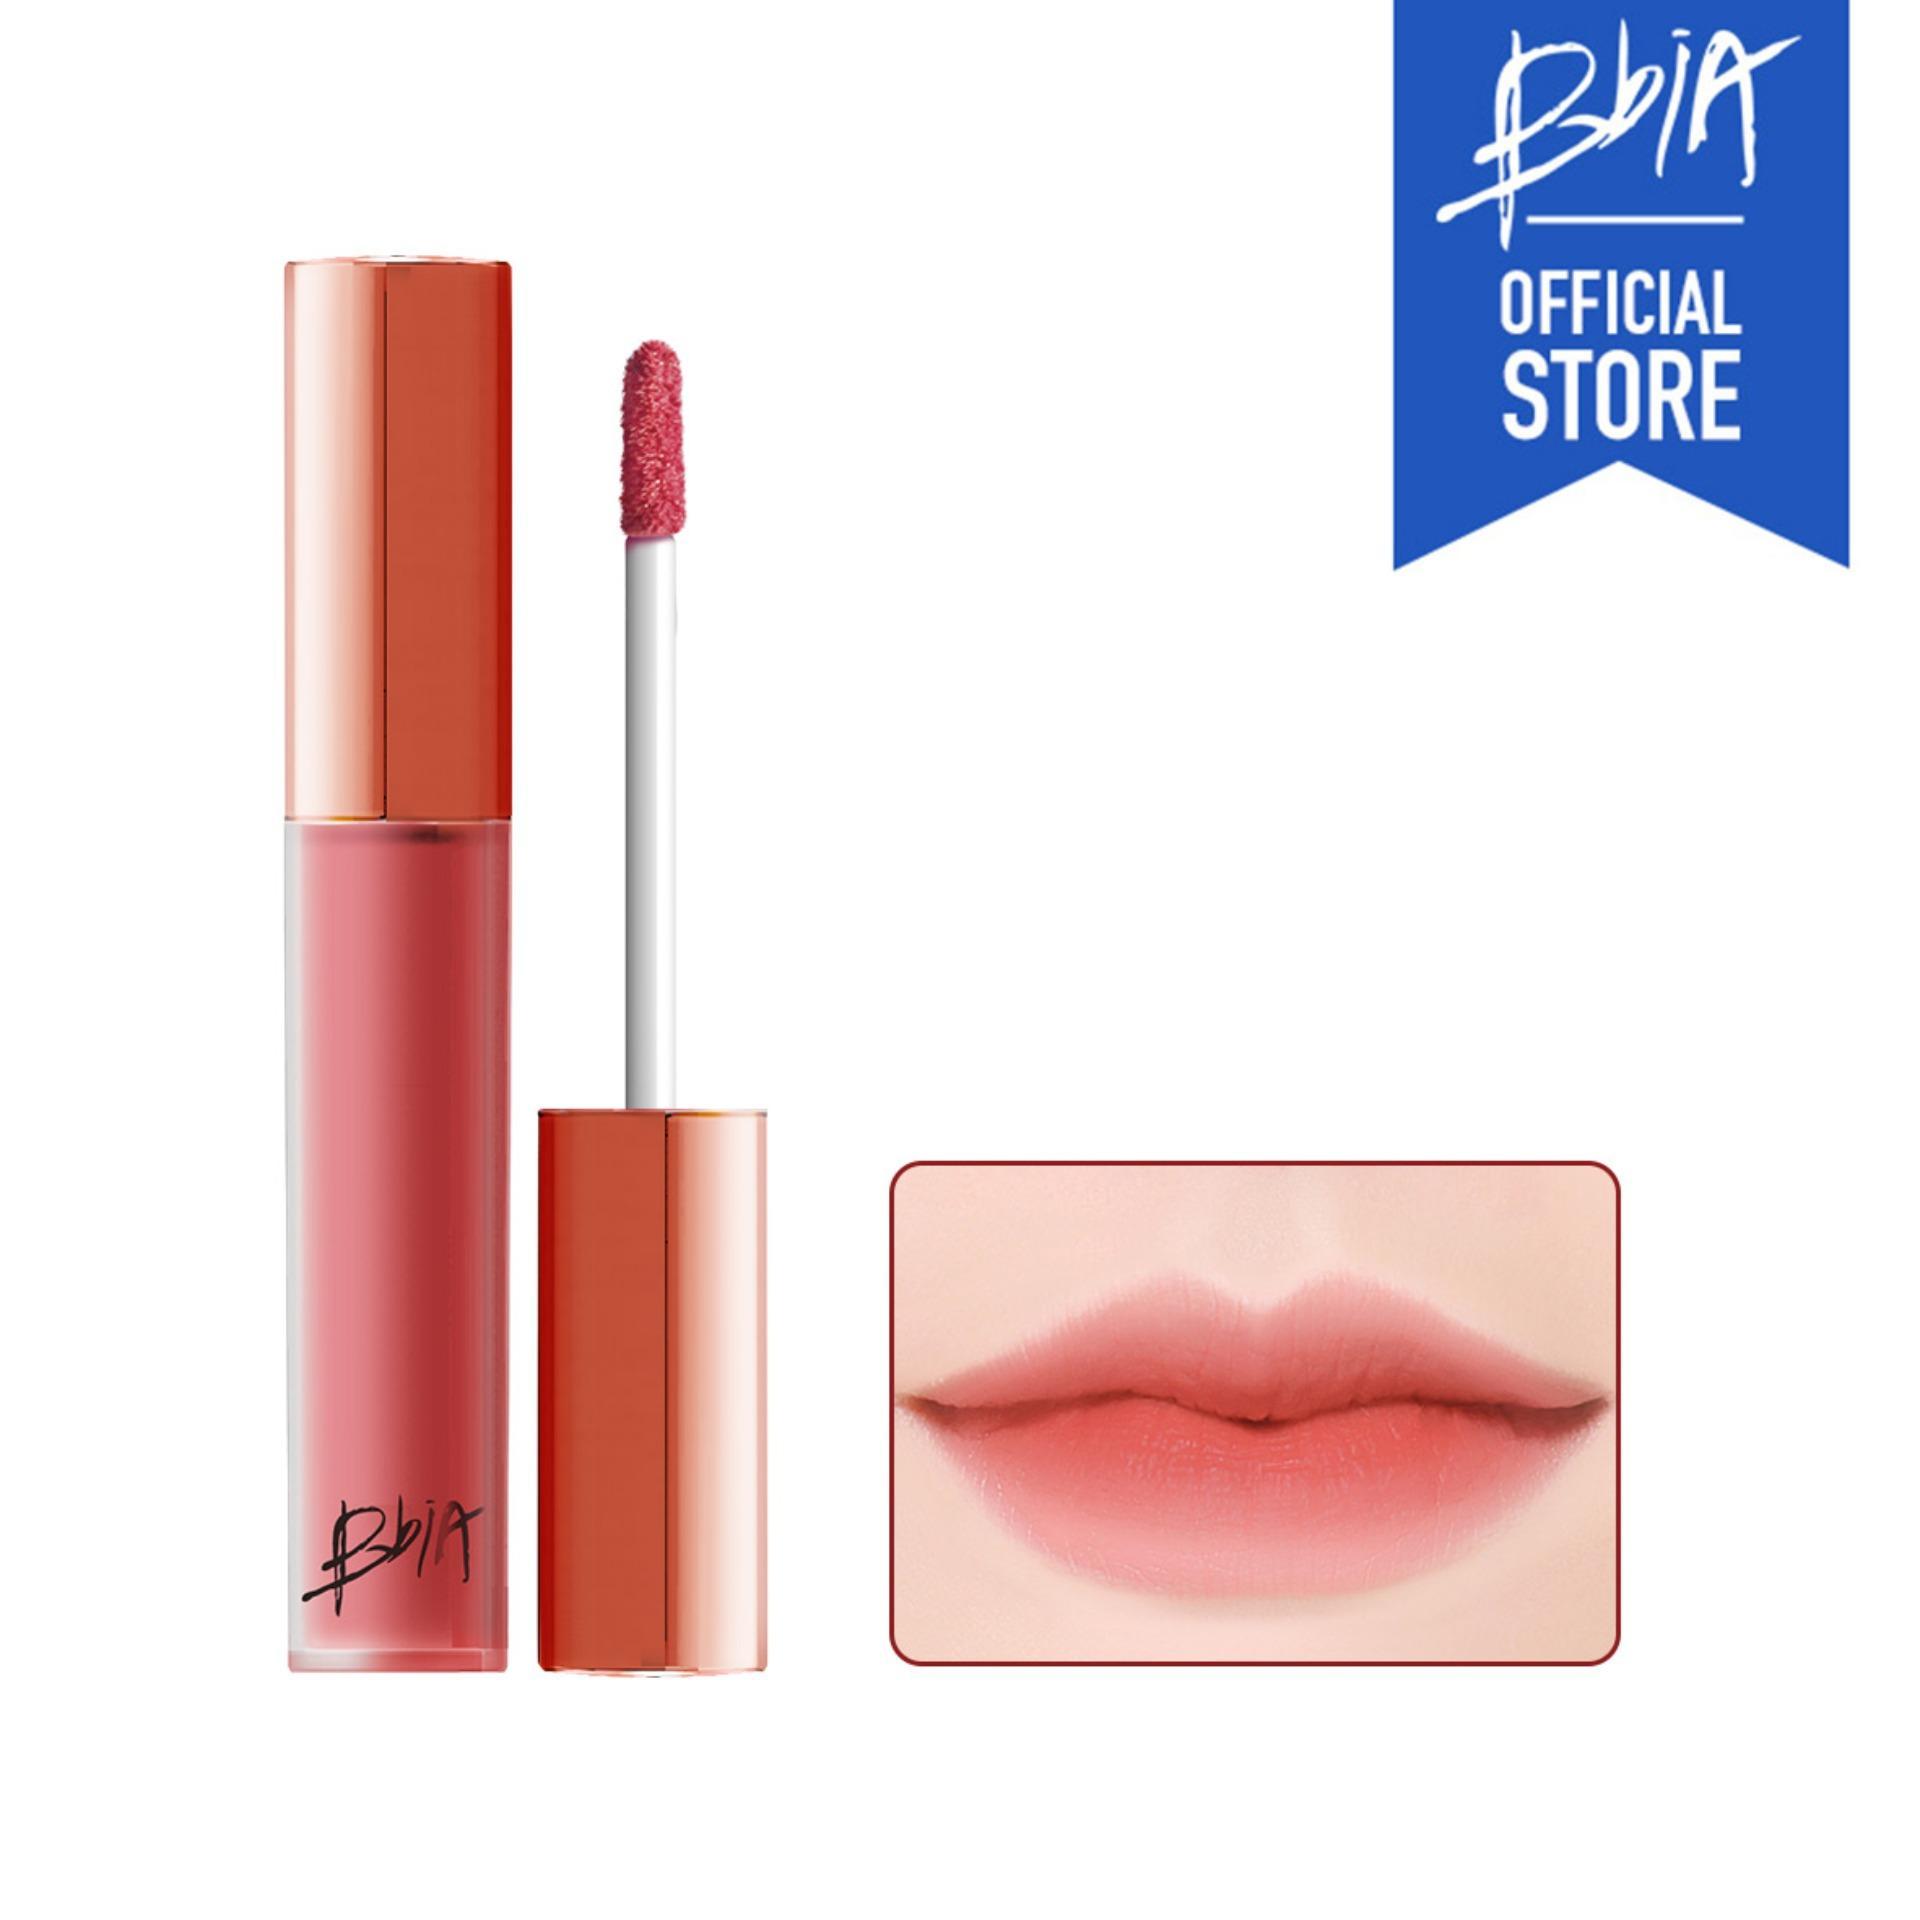 Son kem lì Bbia Last Velvet Lip Tint màu 16 - hồng tươi tốt nhất